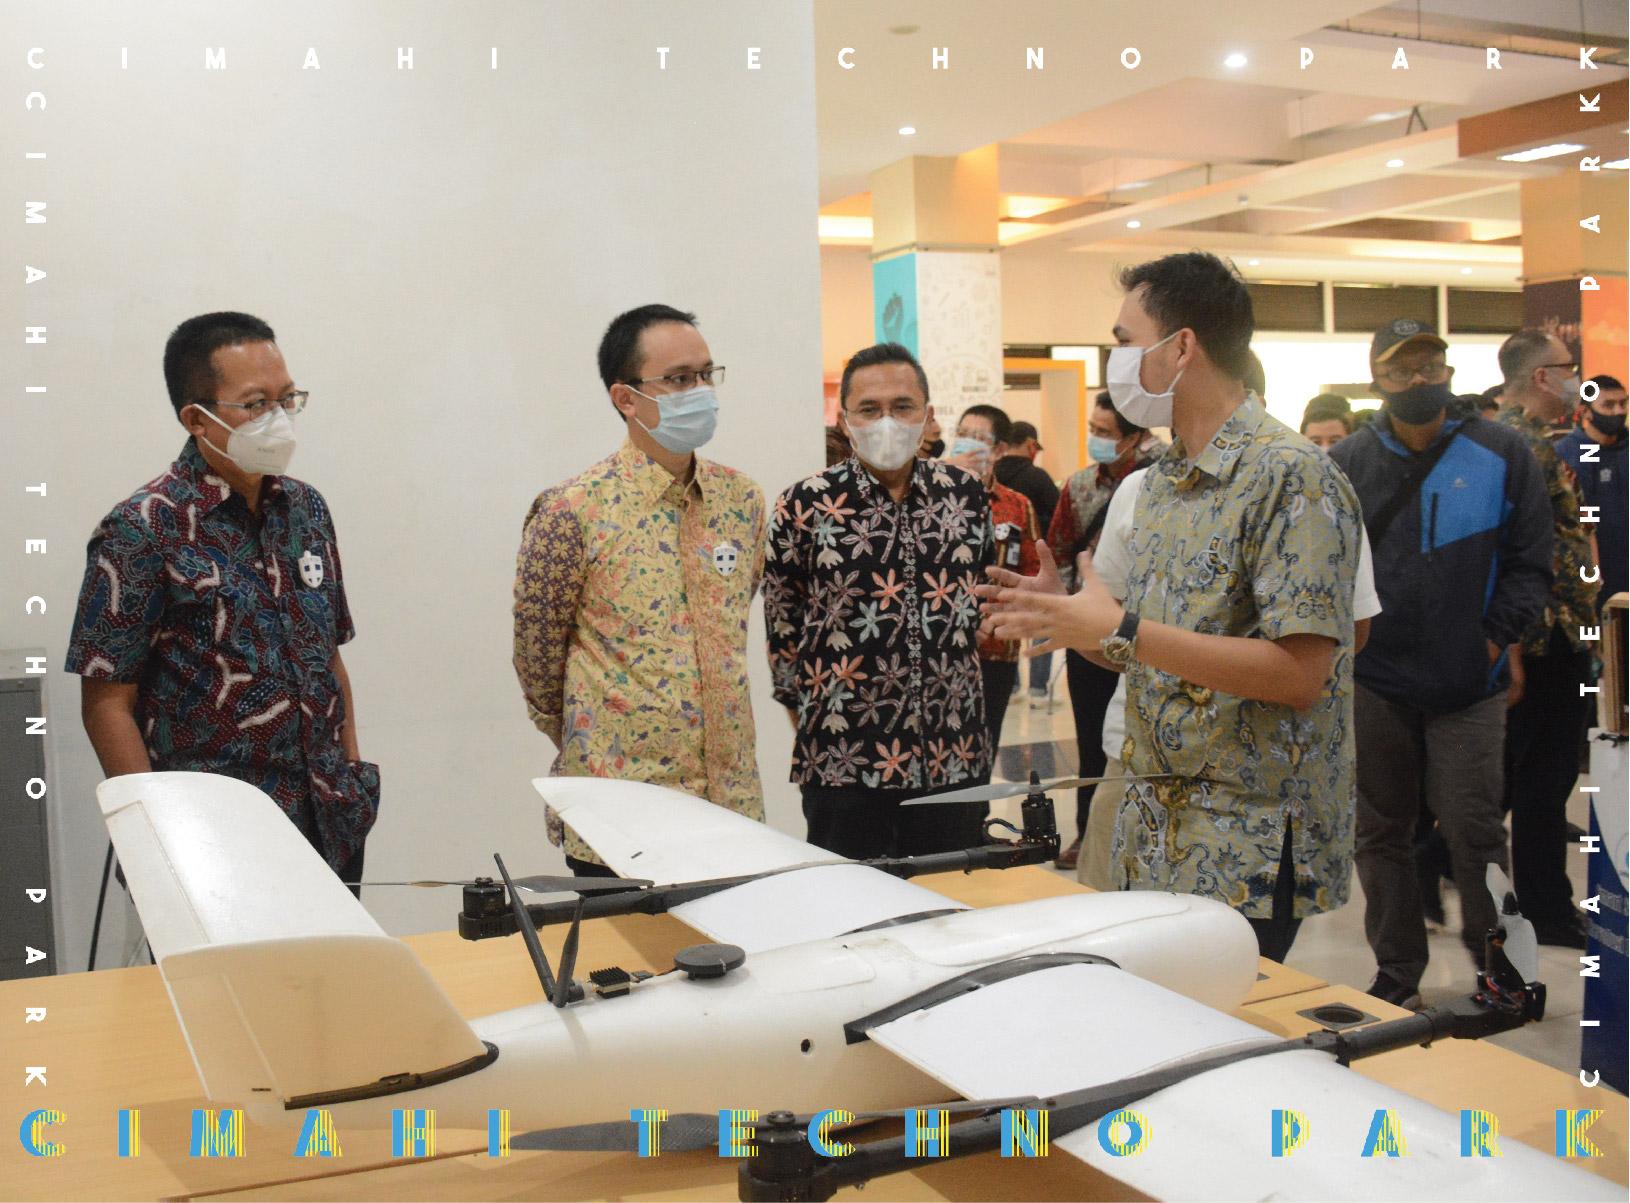 Wamendag RI Dorong Ekspor Produk Digital Kreatif dari Cimahi Techno Park